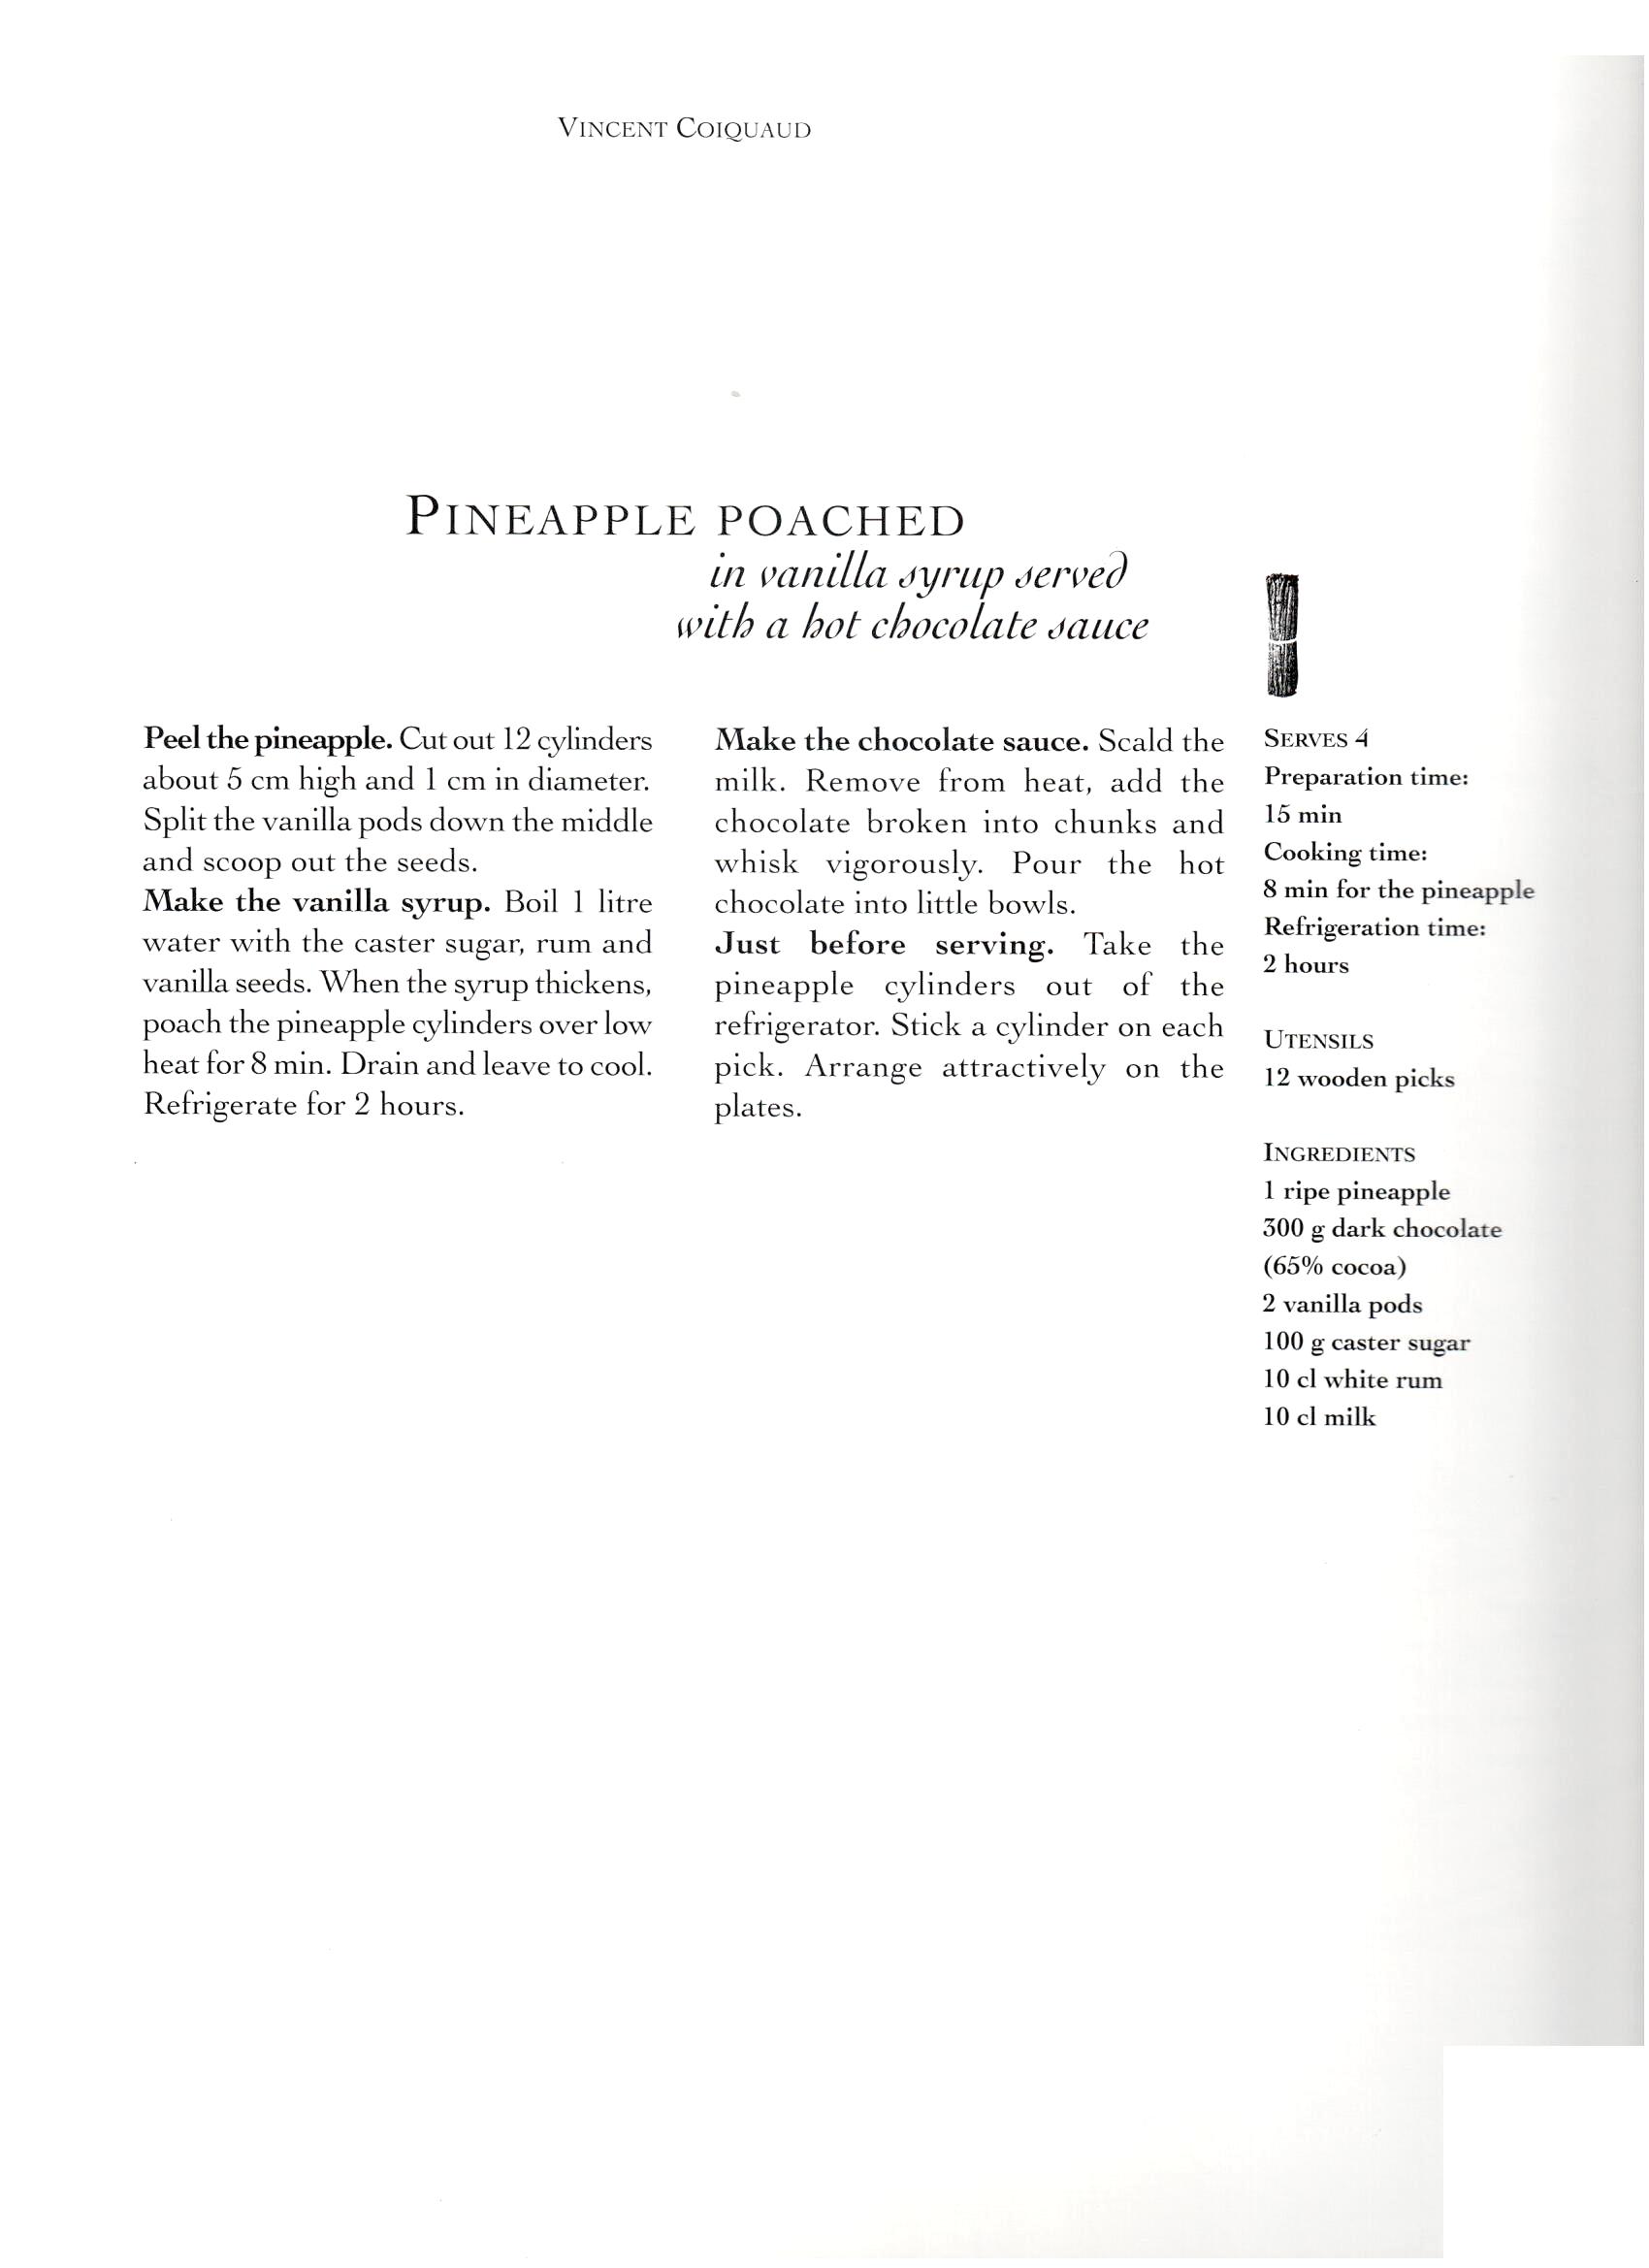 49-pineapple-poached.jpg